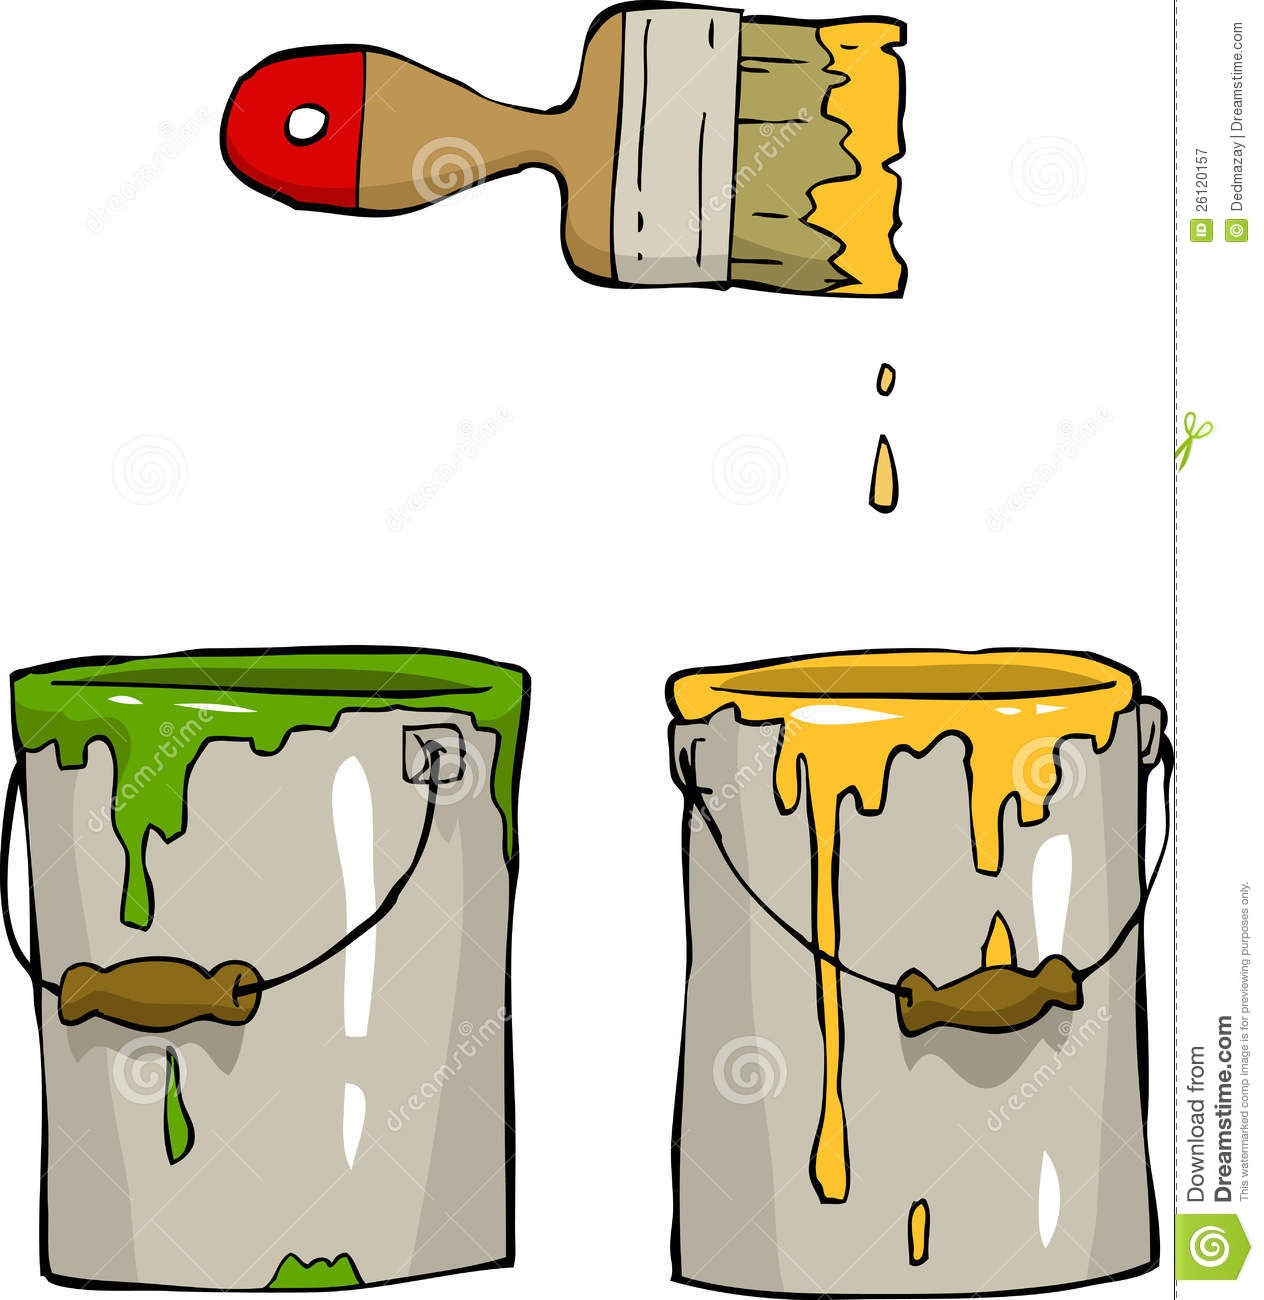 Paint Bucket And Brush Clip Art.